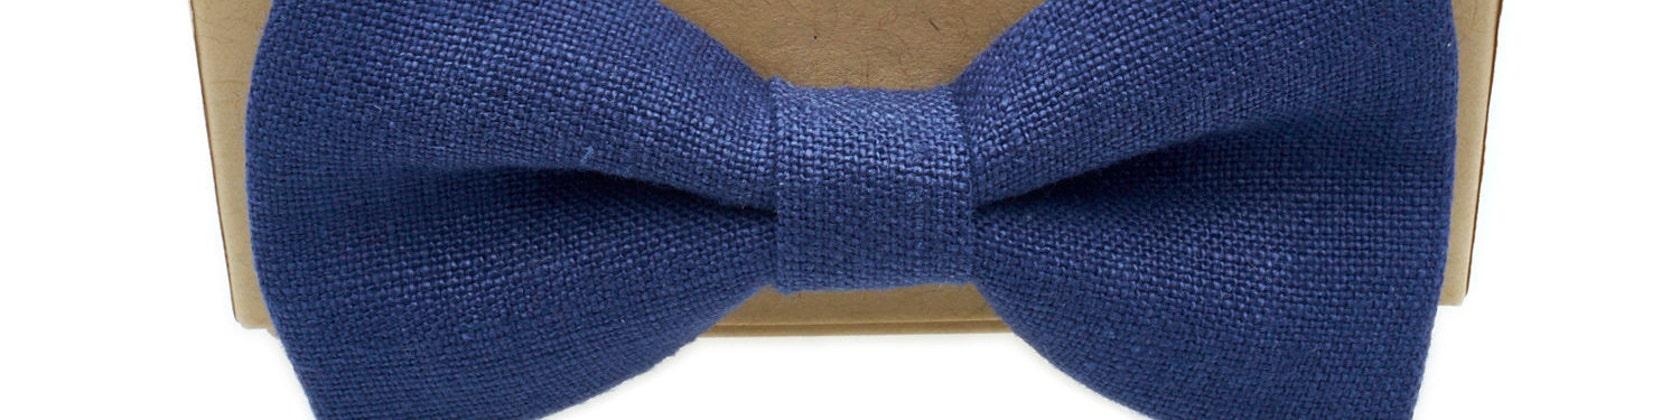 Purveyors of Handmade Bow Ties for Dapper von BelfastBowCompany